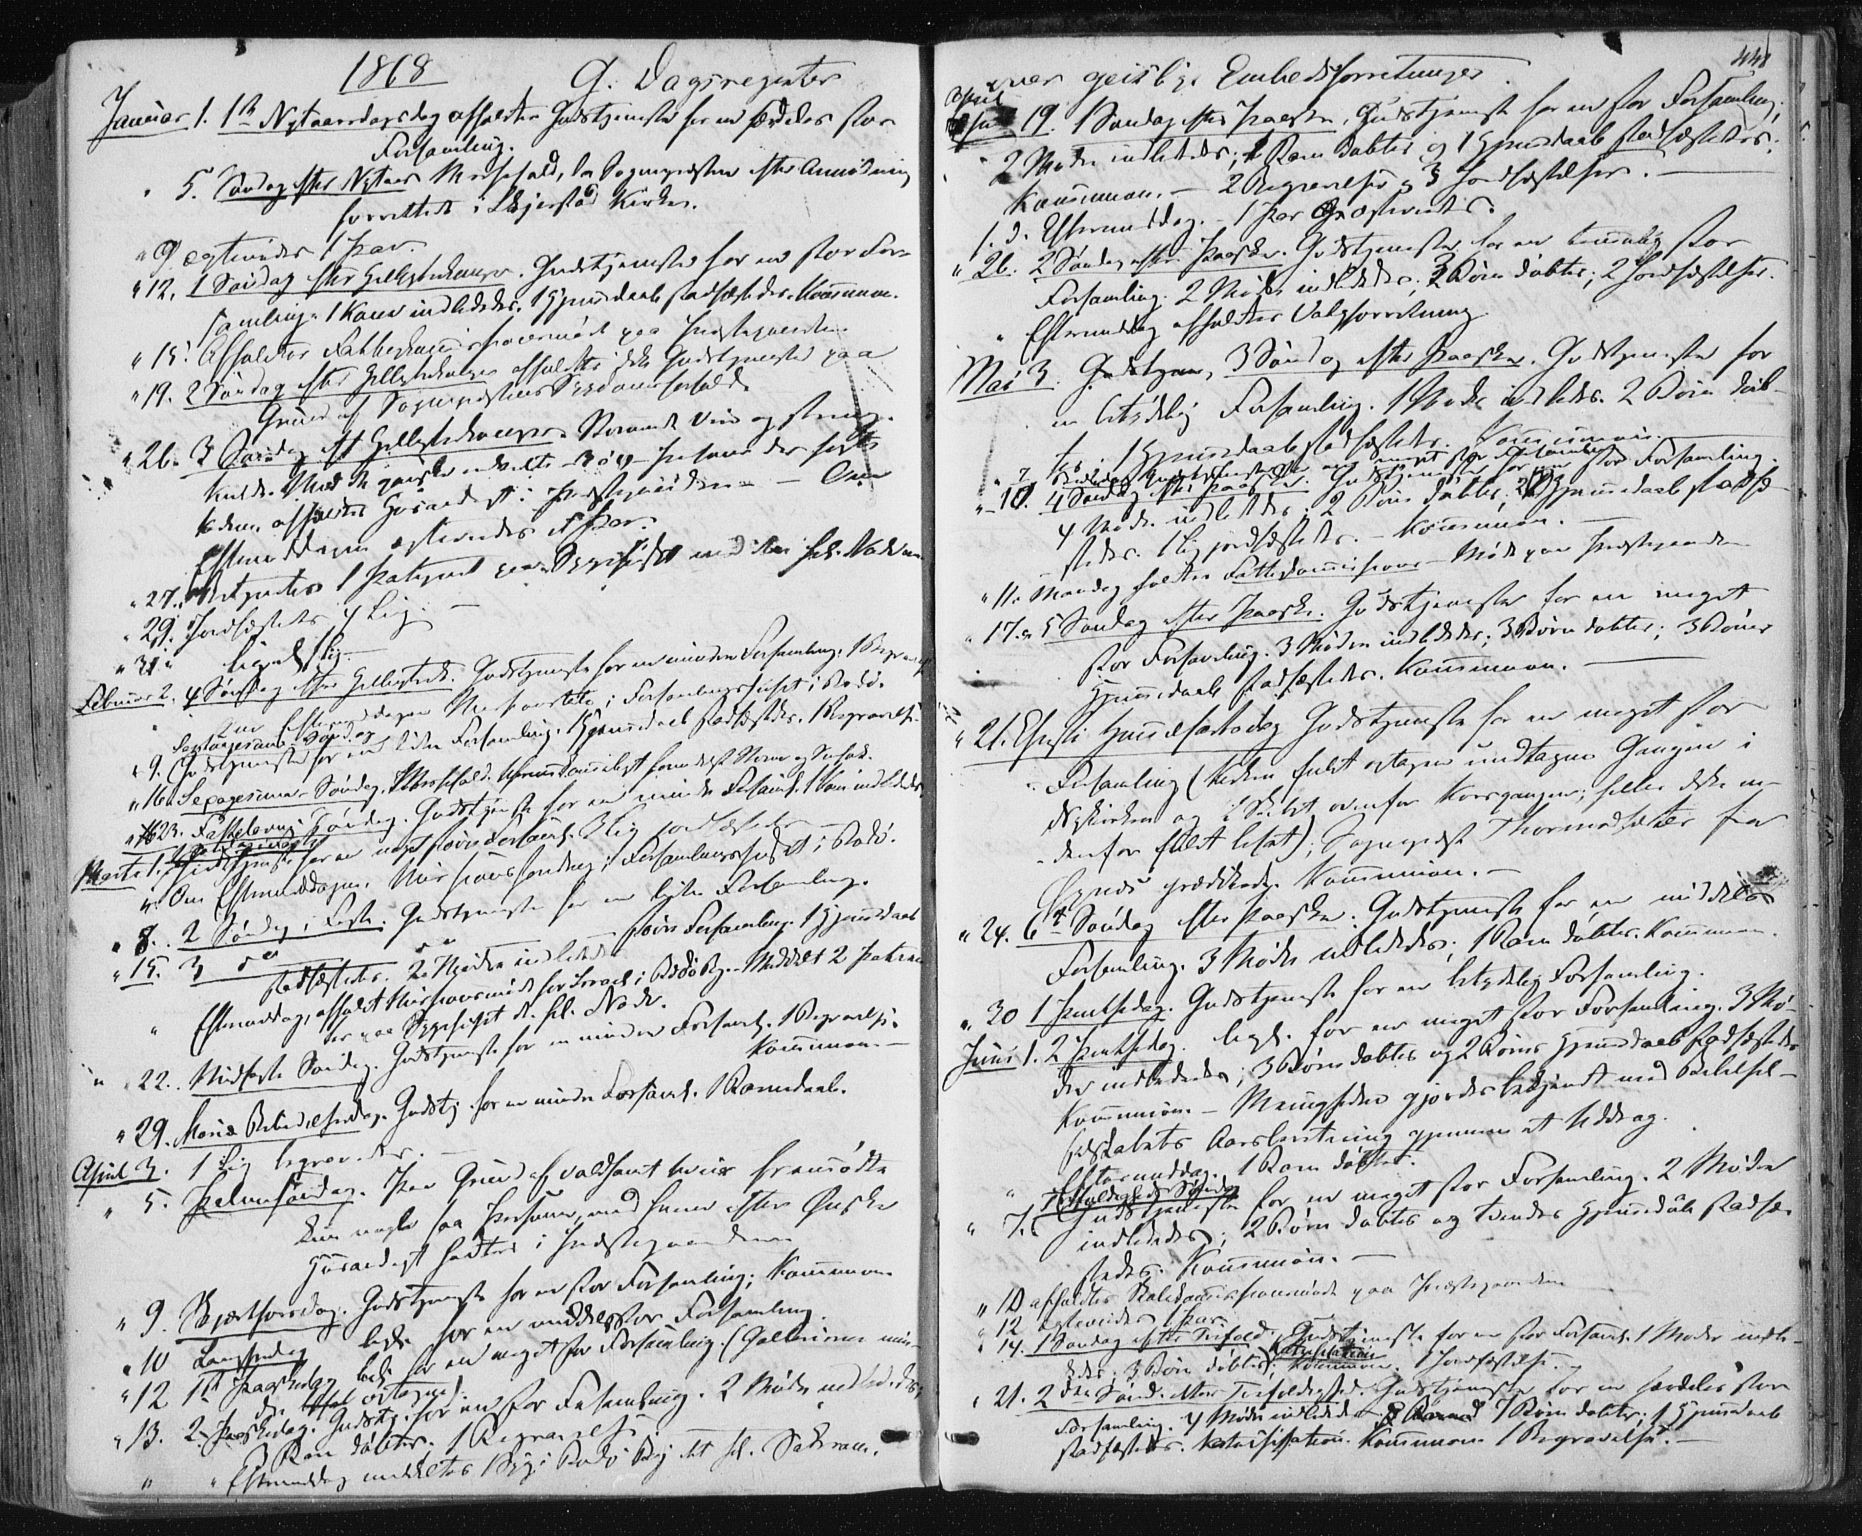 SAT, Ministerialprotokoller, klokkerbøker og fødselsregistre - Nordland, 801/L0008: Ministerialbok nr. 801A08, 1864-1875, s. 448